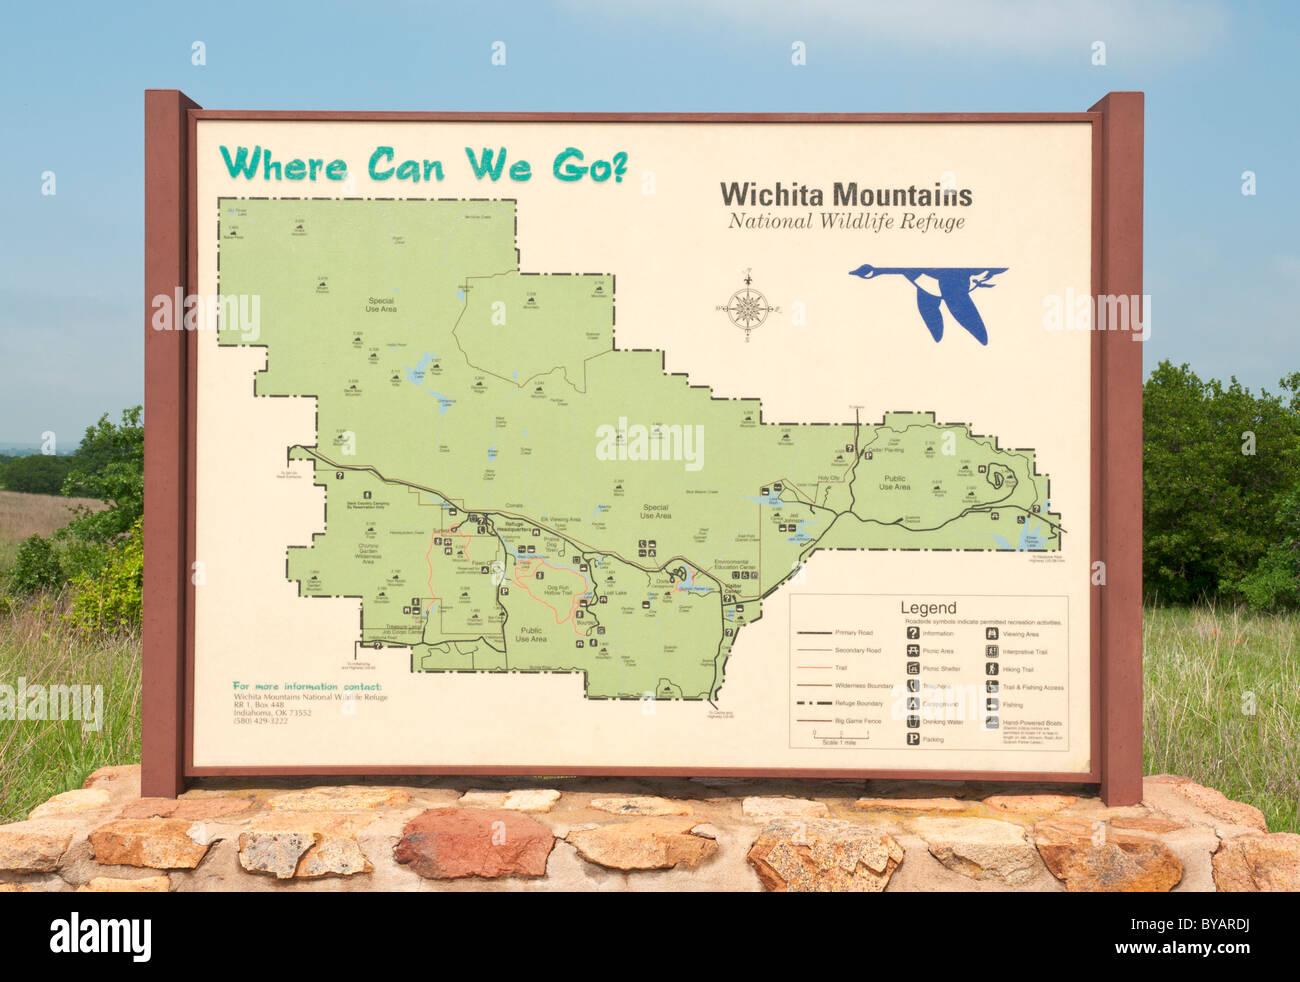 Mountains In Oklahoma Map.Oklahoma Wichita Mountains National Wildlife Refuge Map Sign Stock